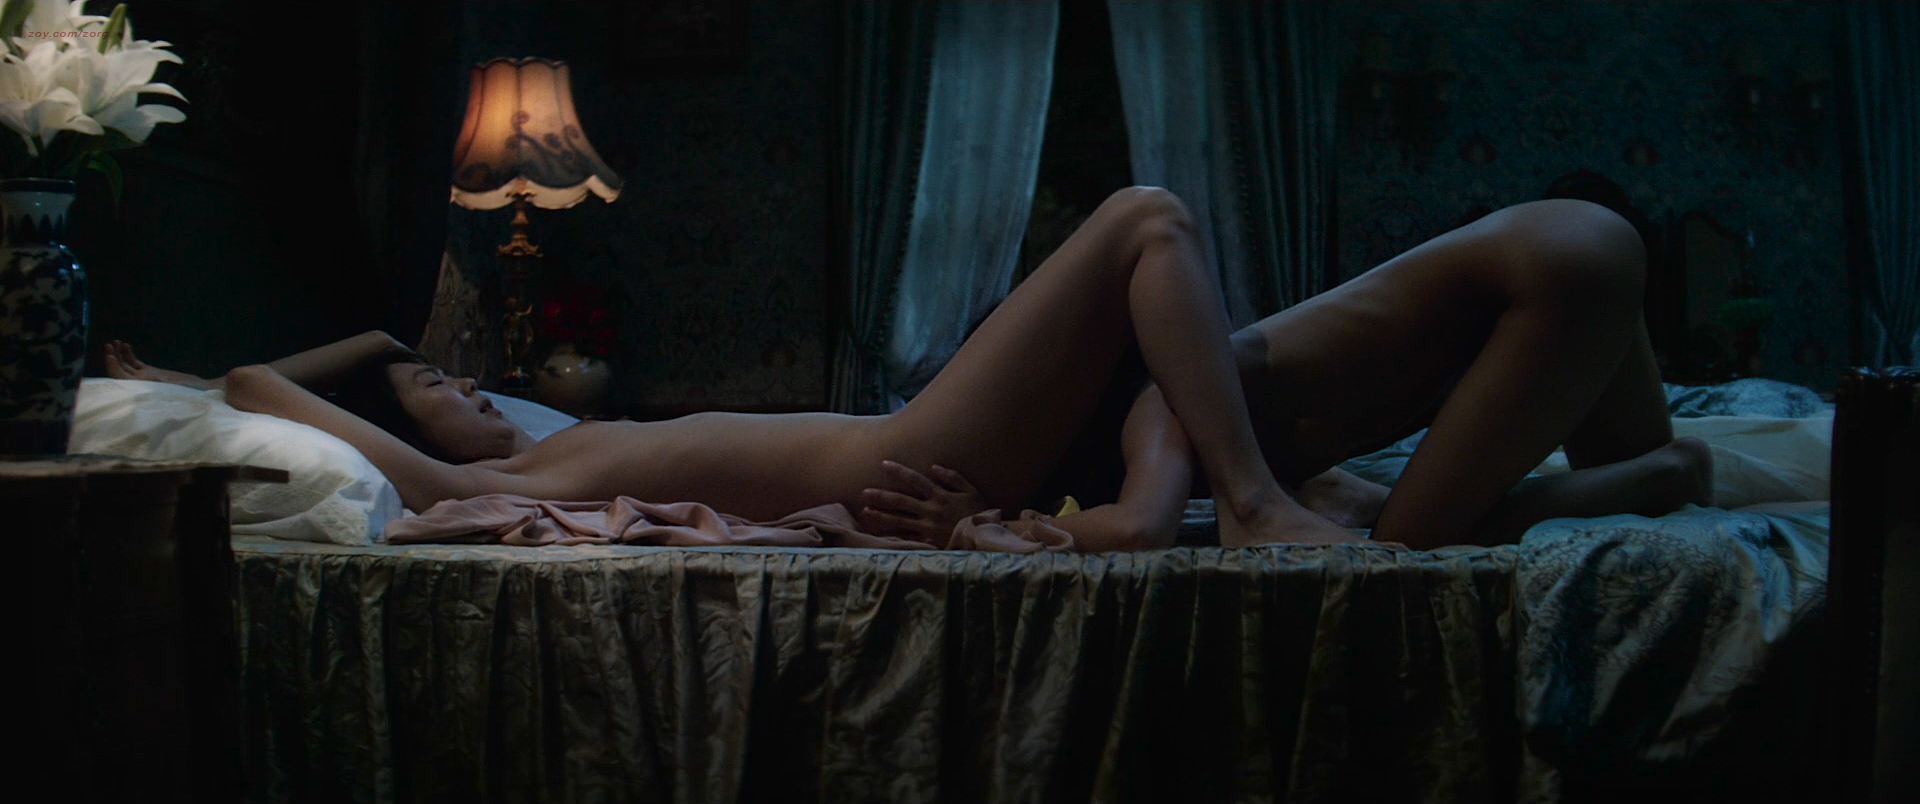 Kim Min-Hee nude topless oral and Kim Tae-Ri nude lesbian sex - The Handmaiden (KR-2016) HD 1080p BluRay (6)